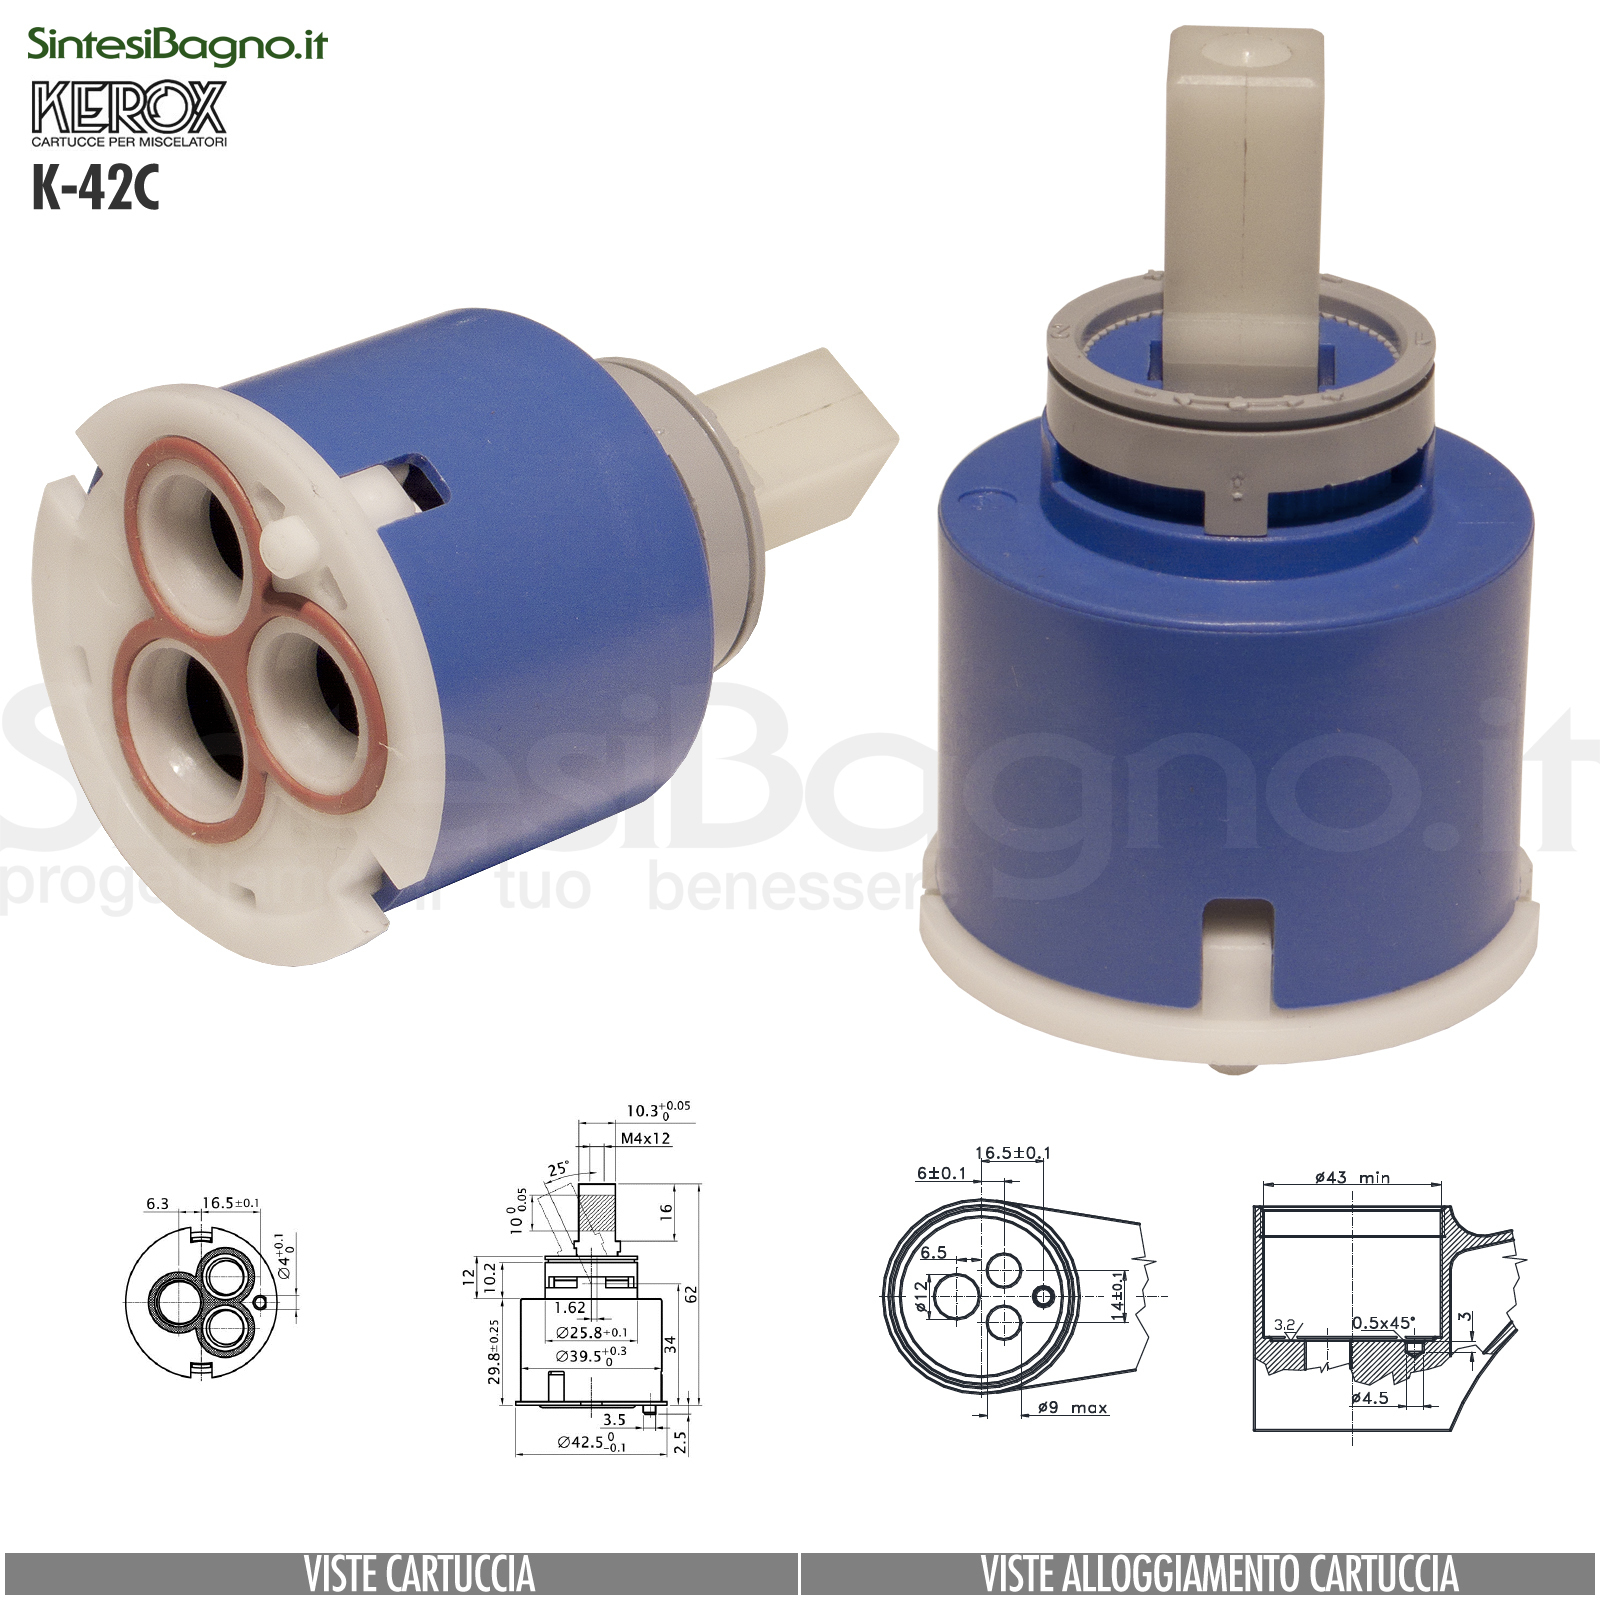 KEROX K 42 C | Cartuccia KEROX K-42C di ricambio per miscelatore monocomando Ø 42 mm